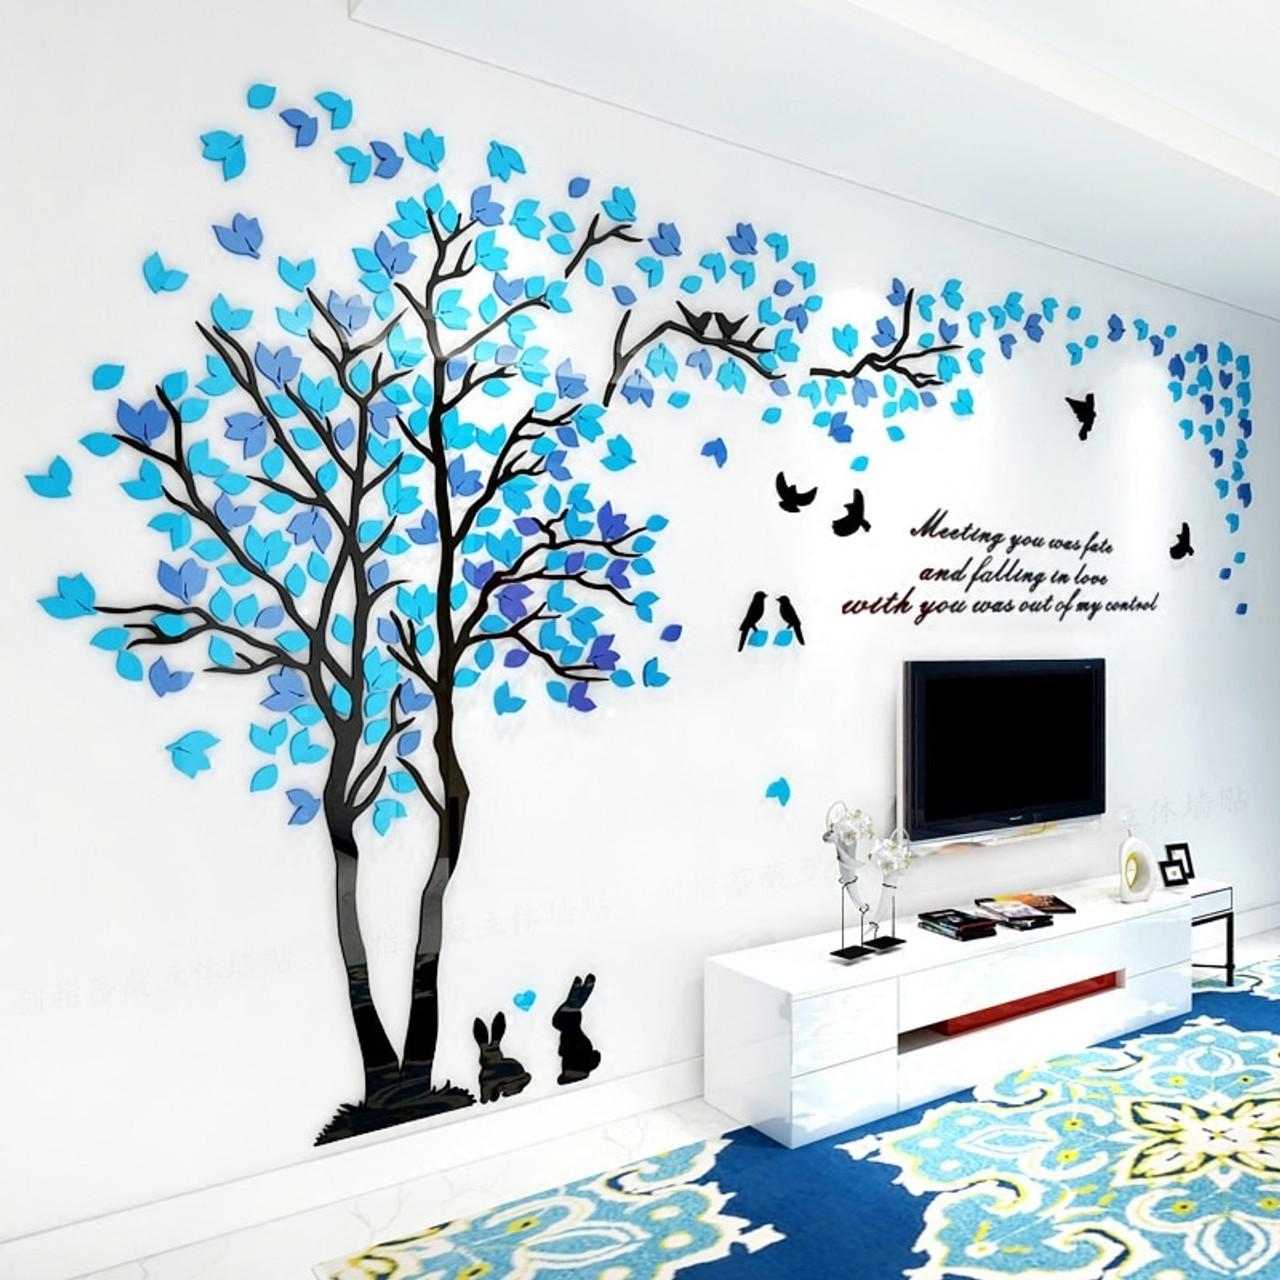 Creative Couple Tree 3d Wall Stickers Living Room Bedroom Home Wall Art Decor Diy Acrylic Wall Sticker Decal Cartoon Big Tree Onshopdeals Com